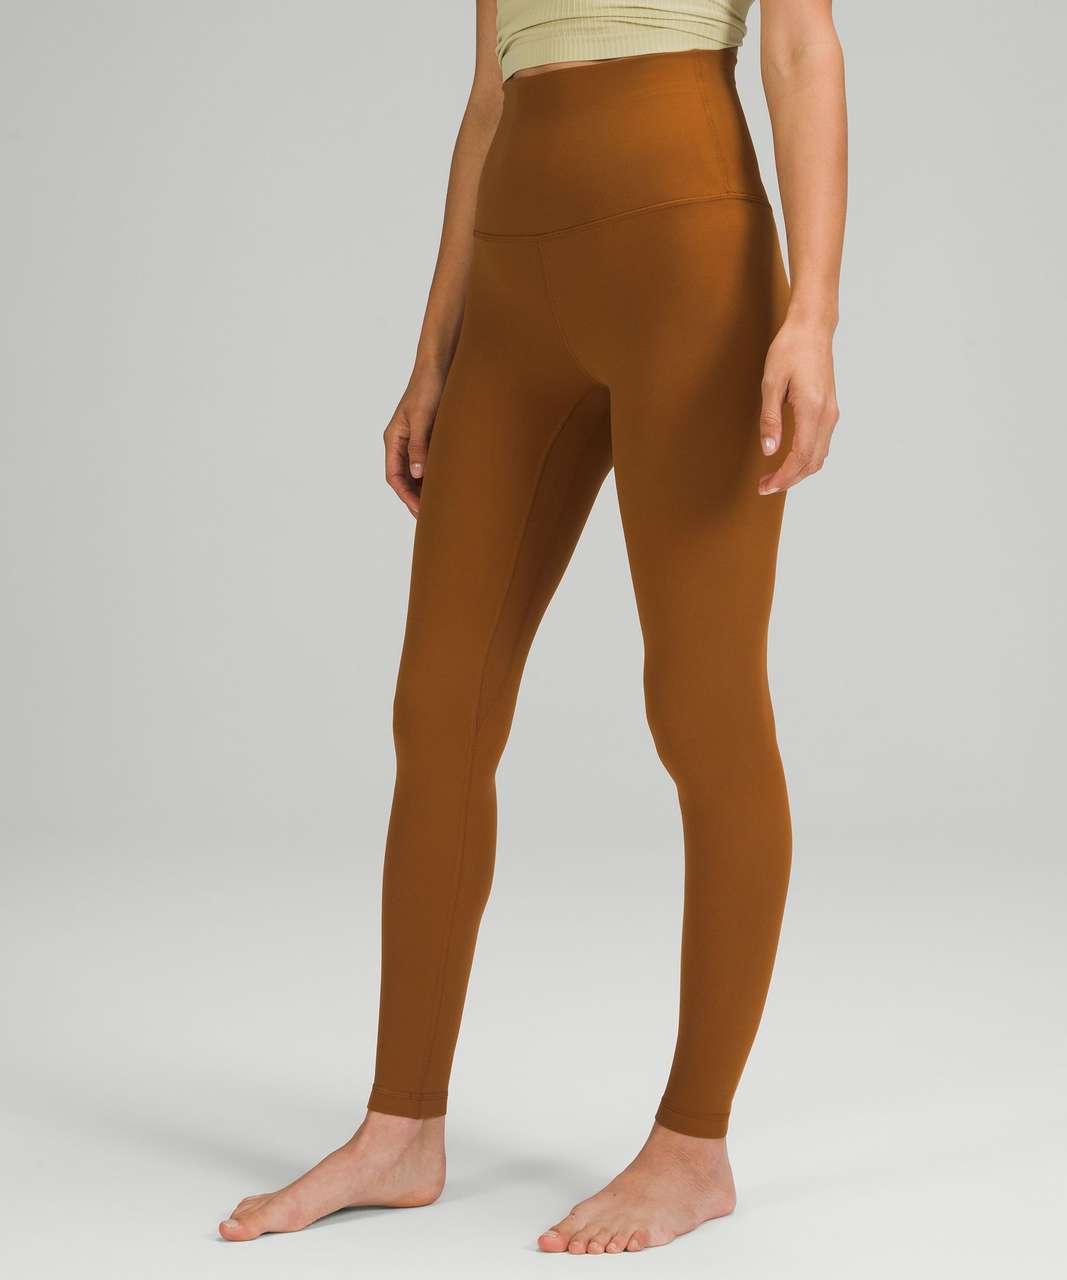 "Lululemon Align Super-High-Rise Pant 28"" - Copper Brown"